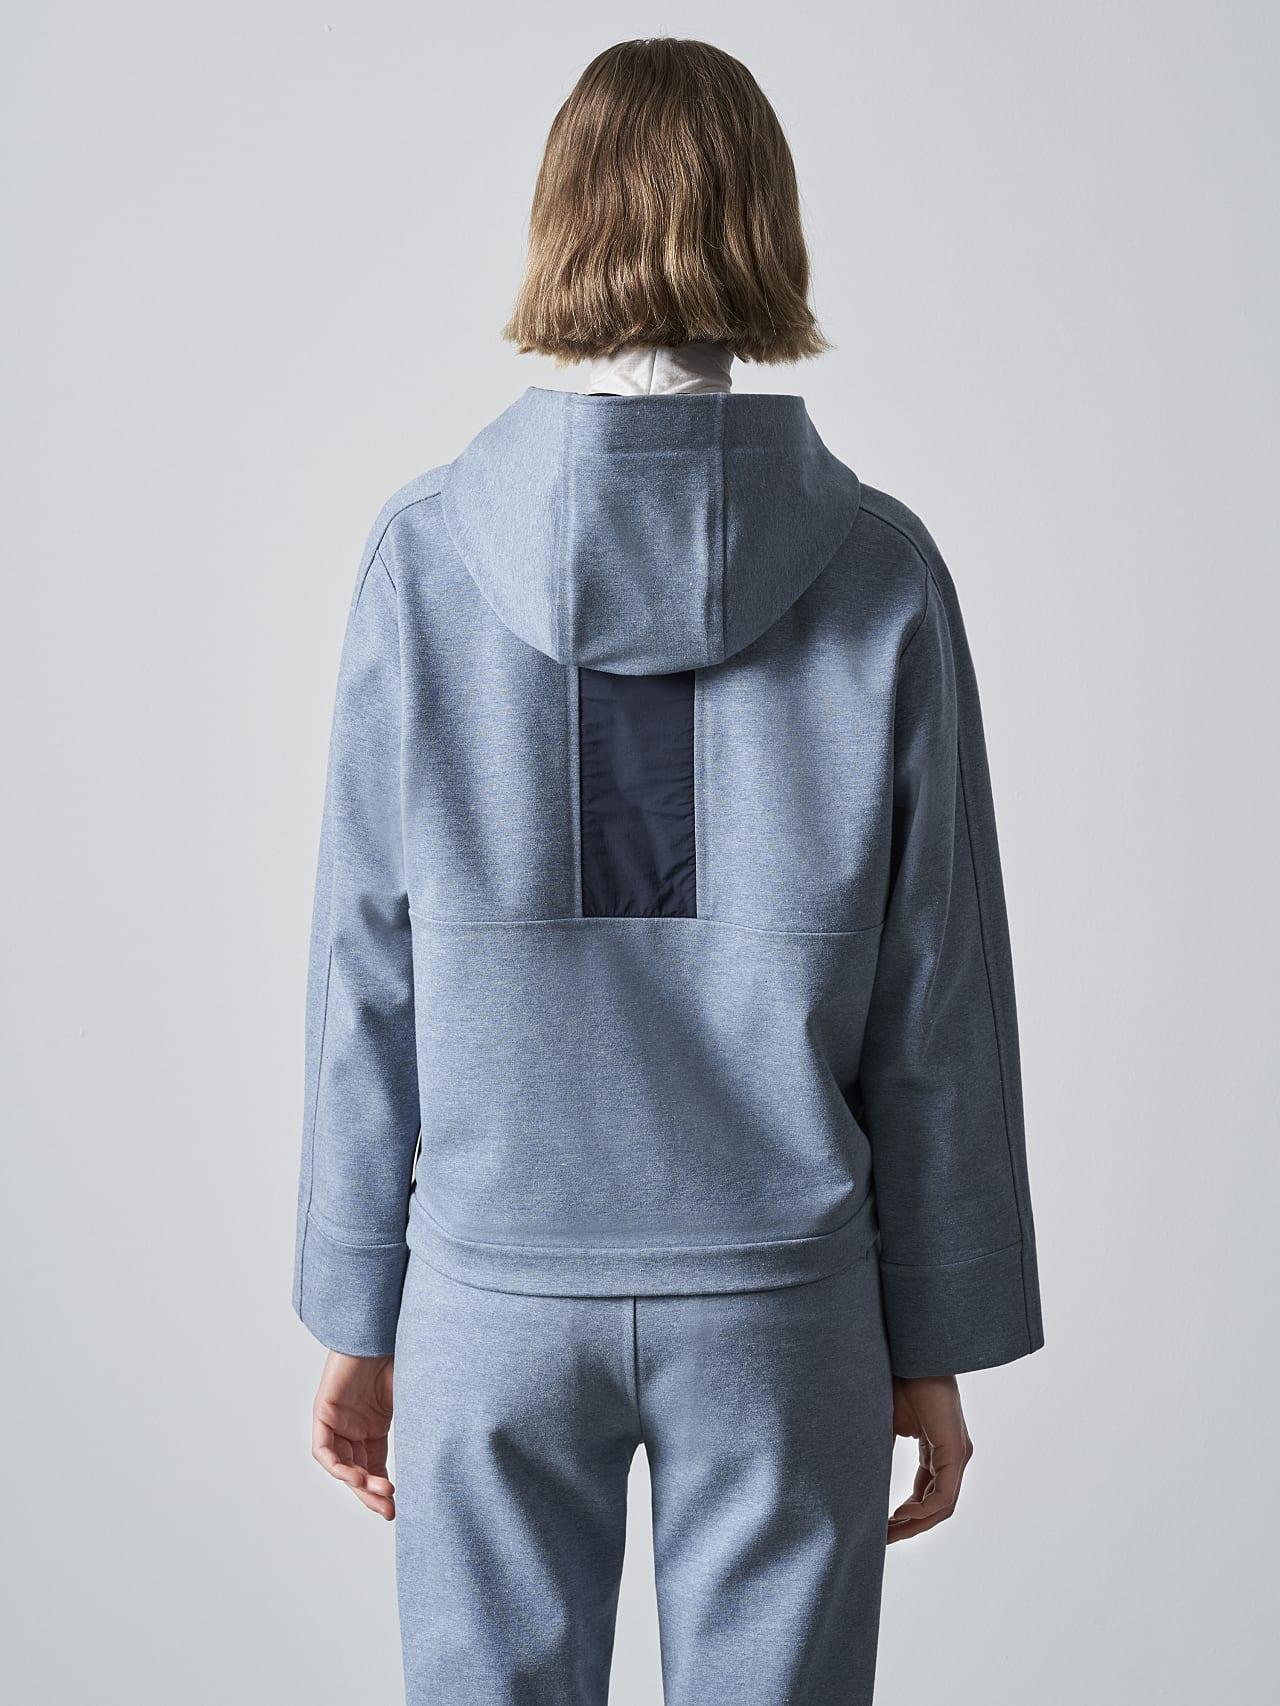 SINNO V2.Y5.02 Waterproof Hooded Jacket medium blue Front Main Alpha Tauri